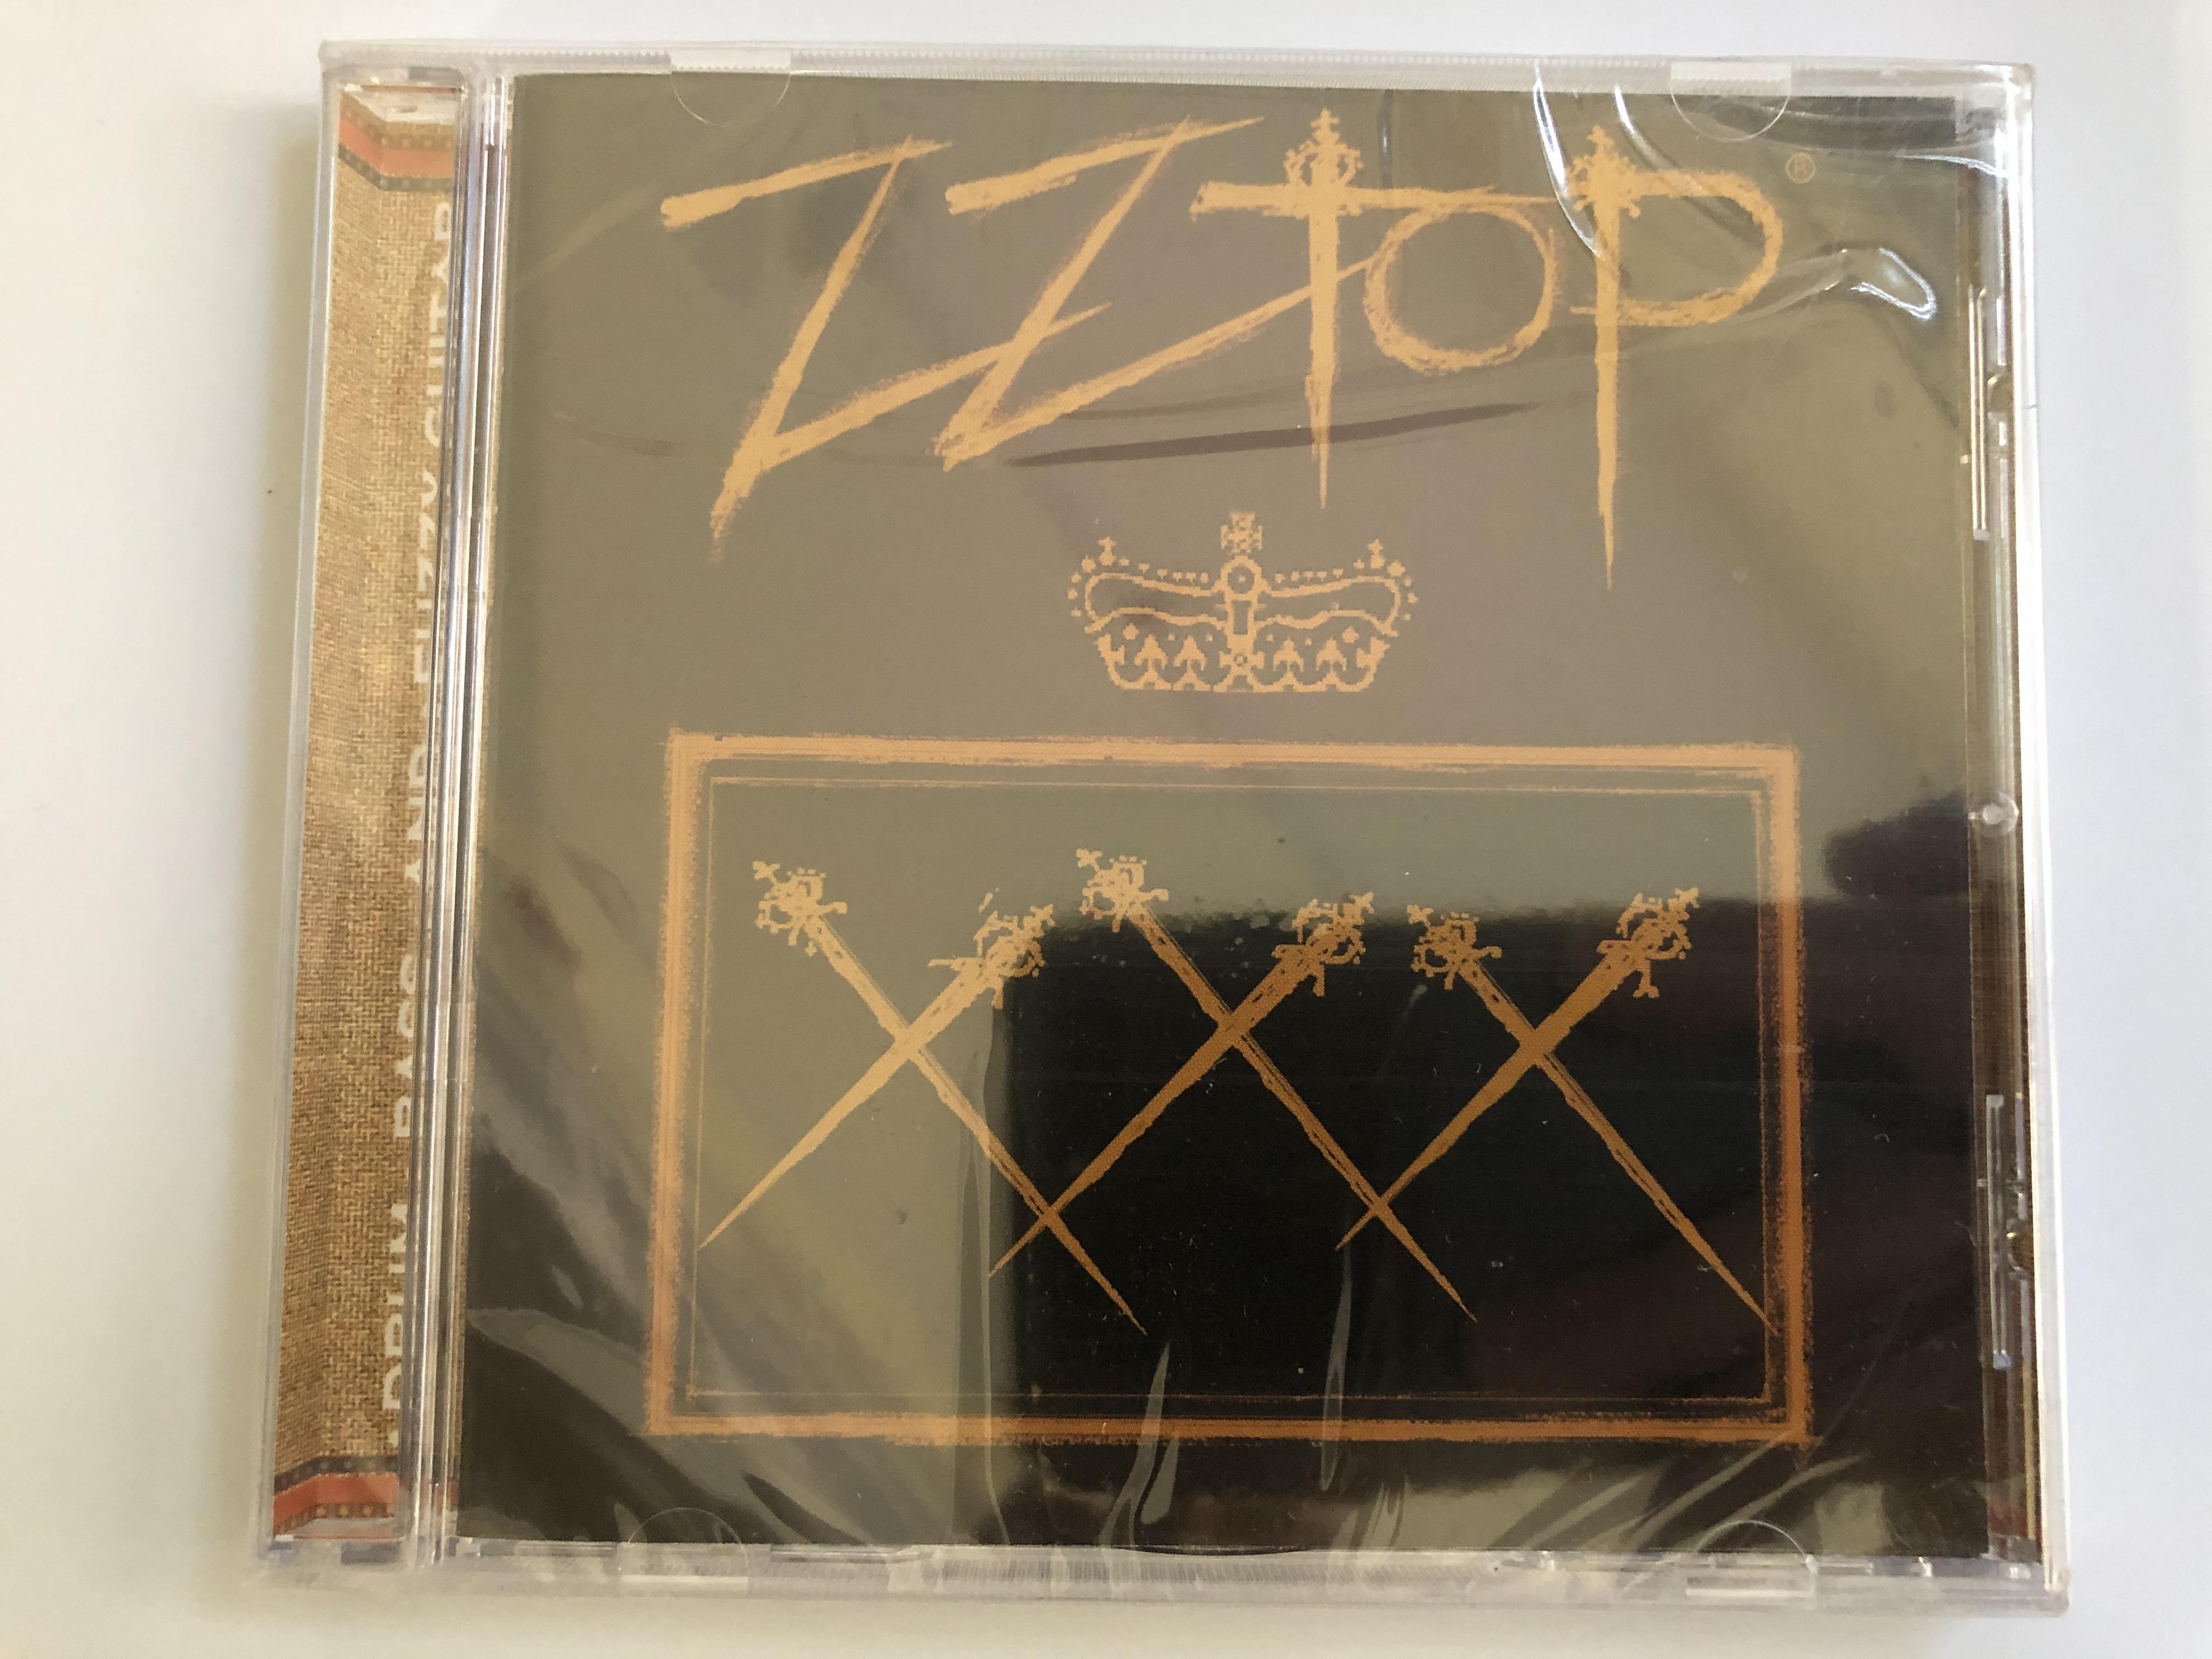 zz-top-xxx-rca-audio-cd-1999-74321-69372-2-1-.jpg